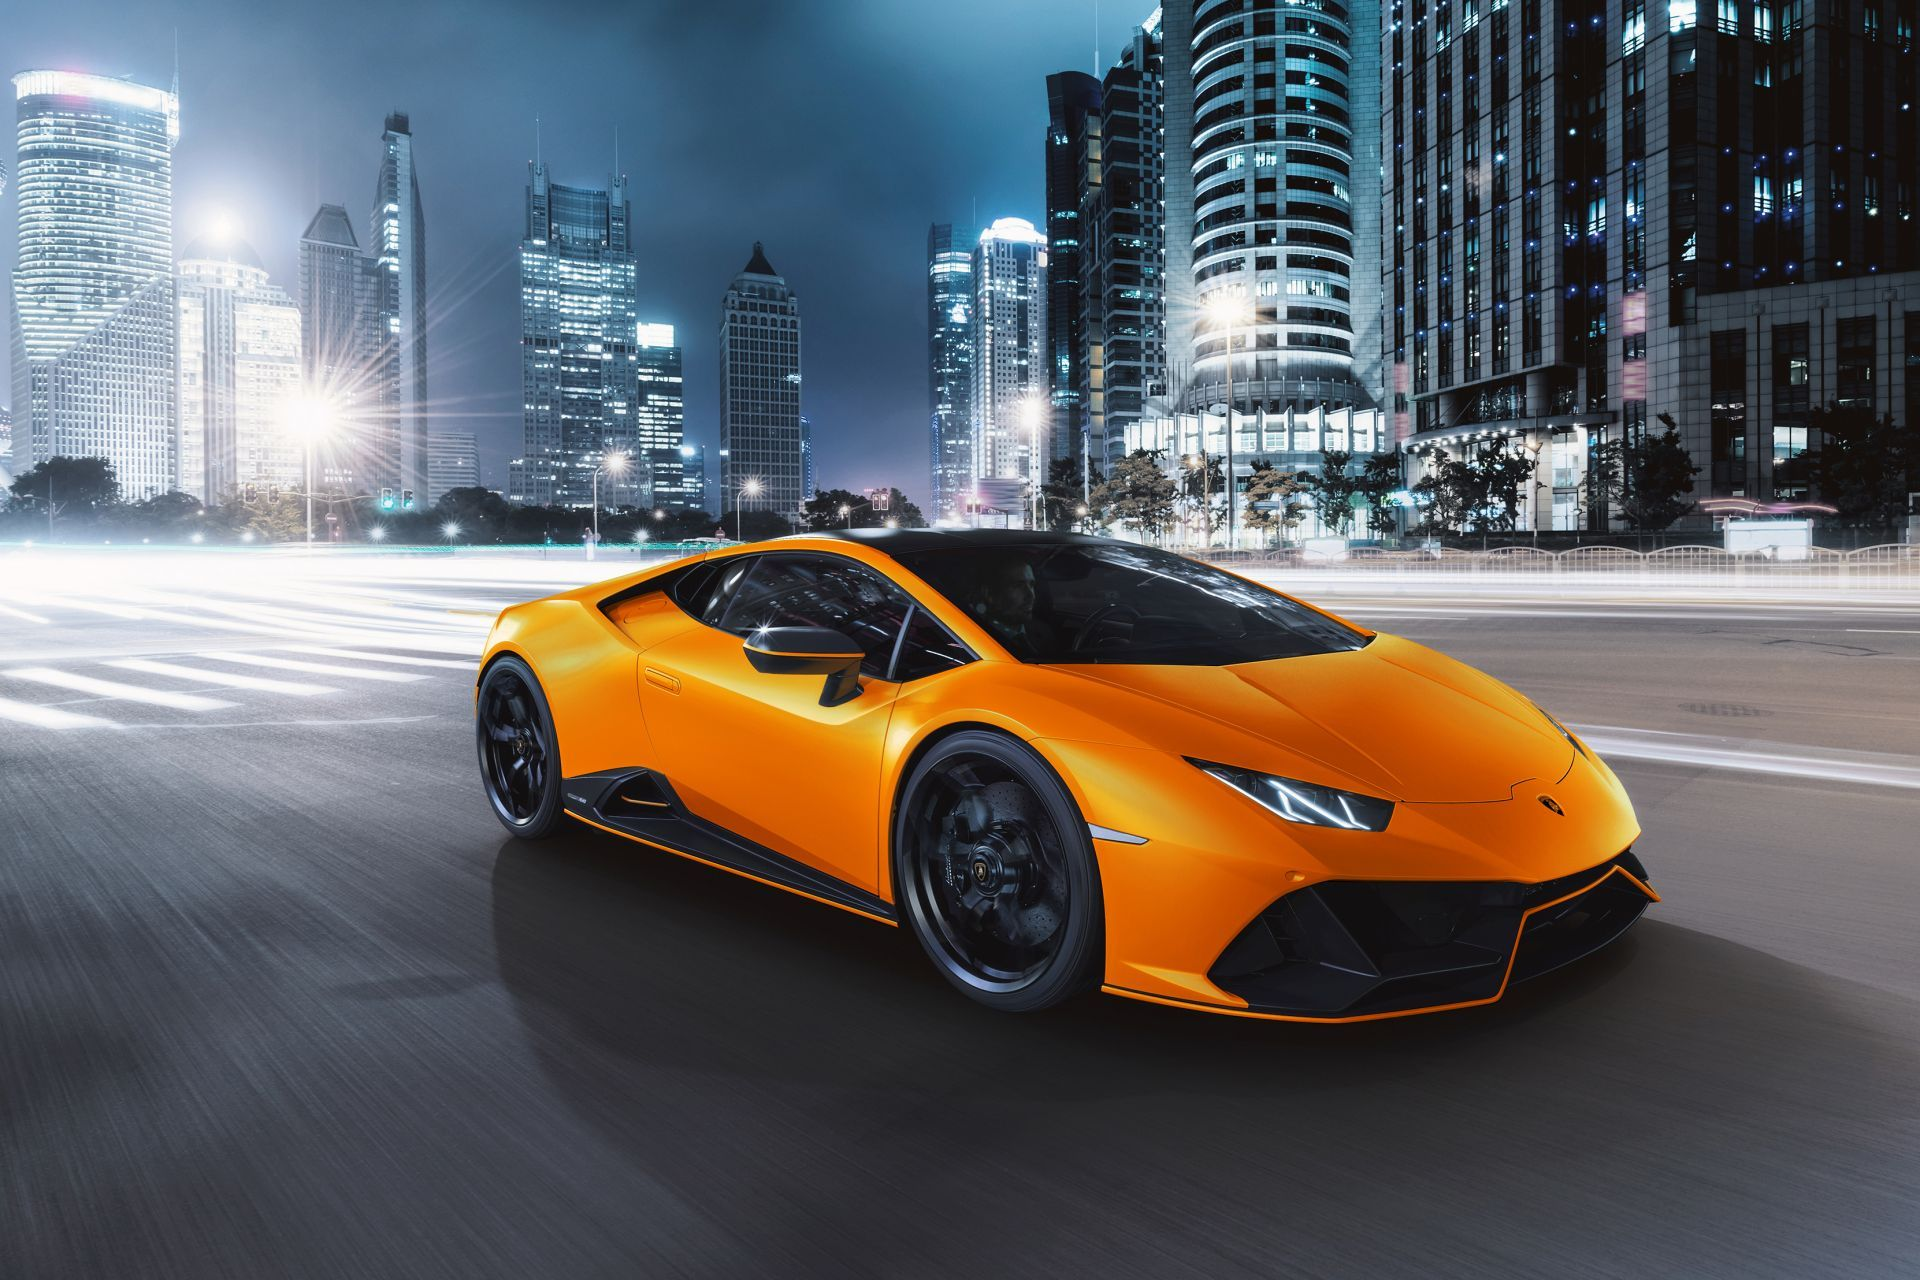 Lamborghini-Huracan-Evo-Fluo-Capsule-20